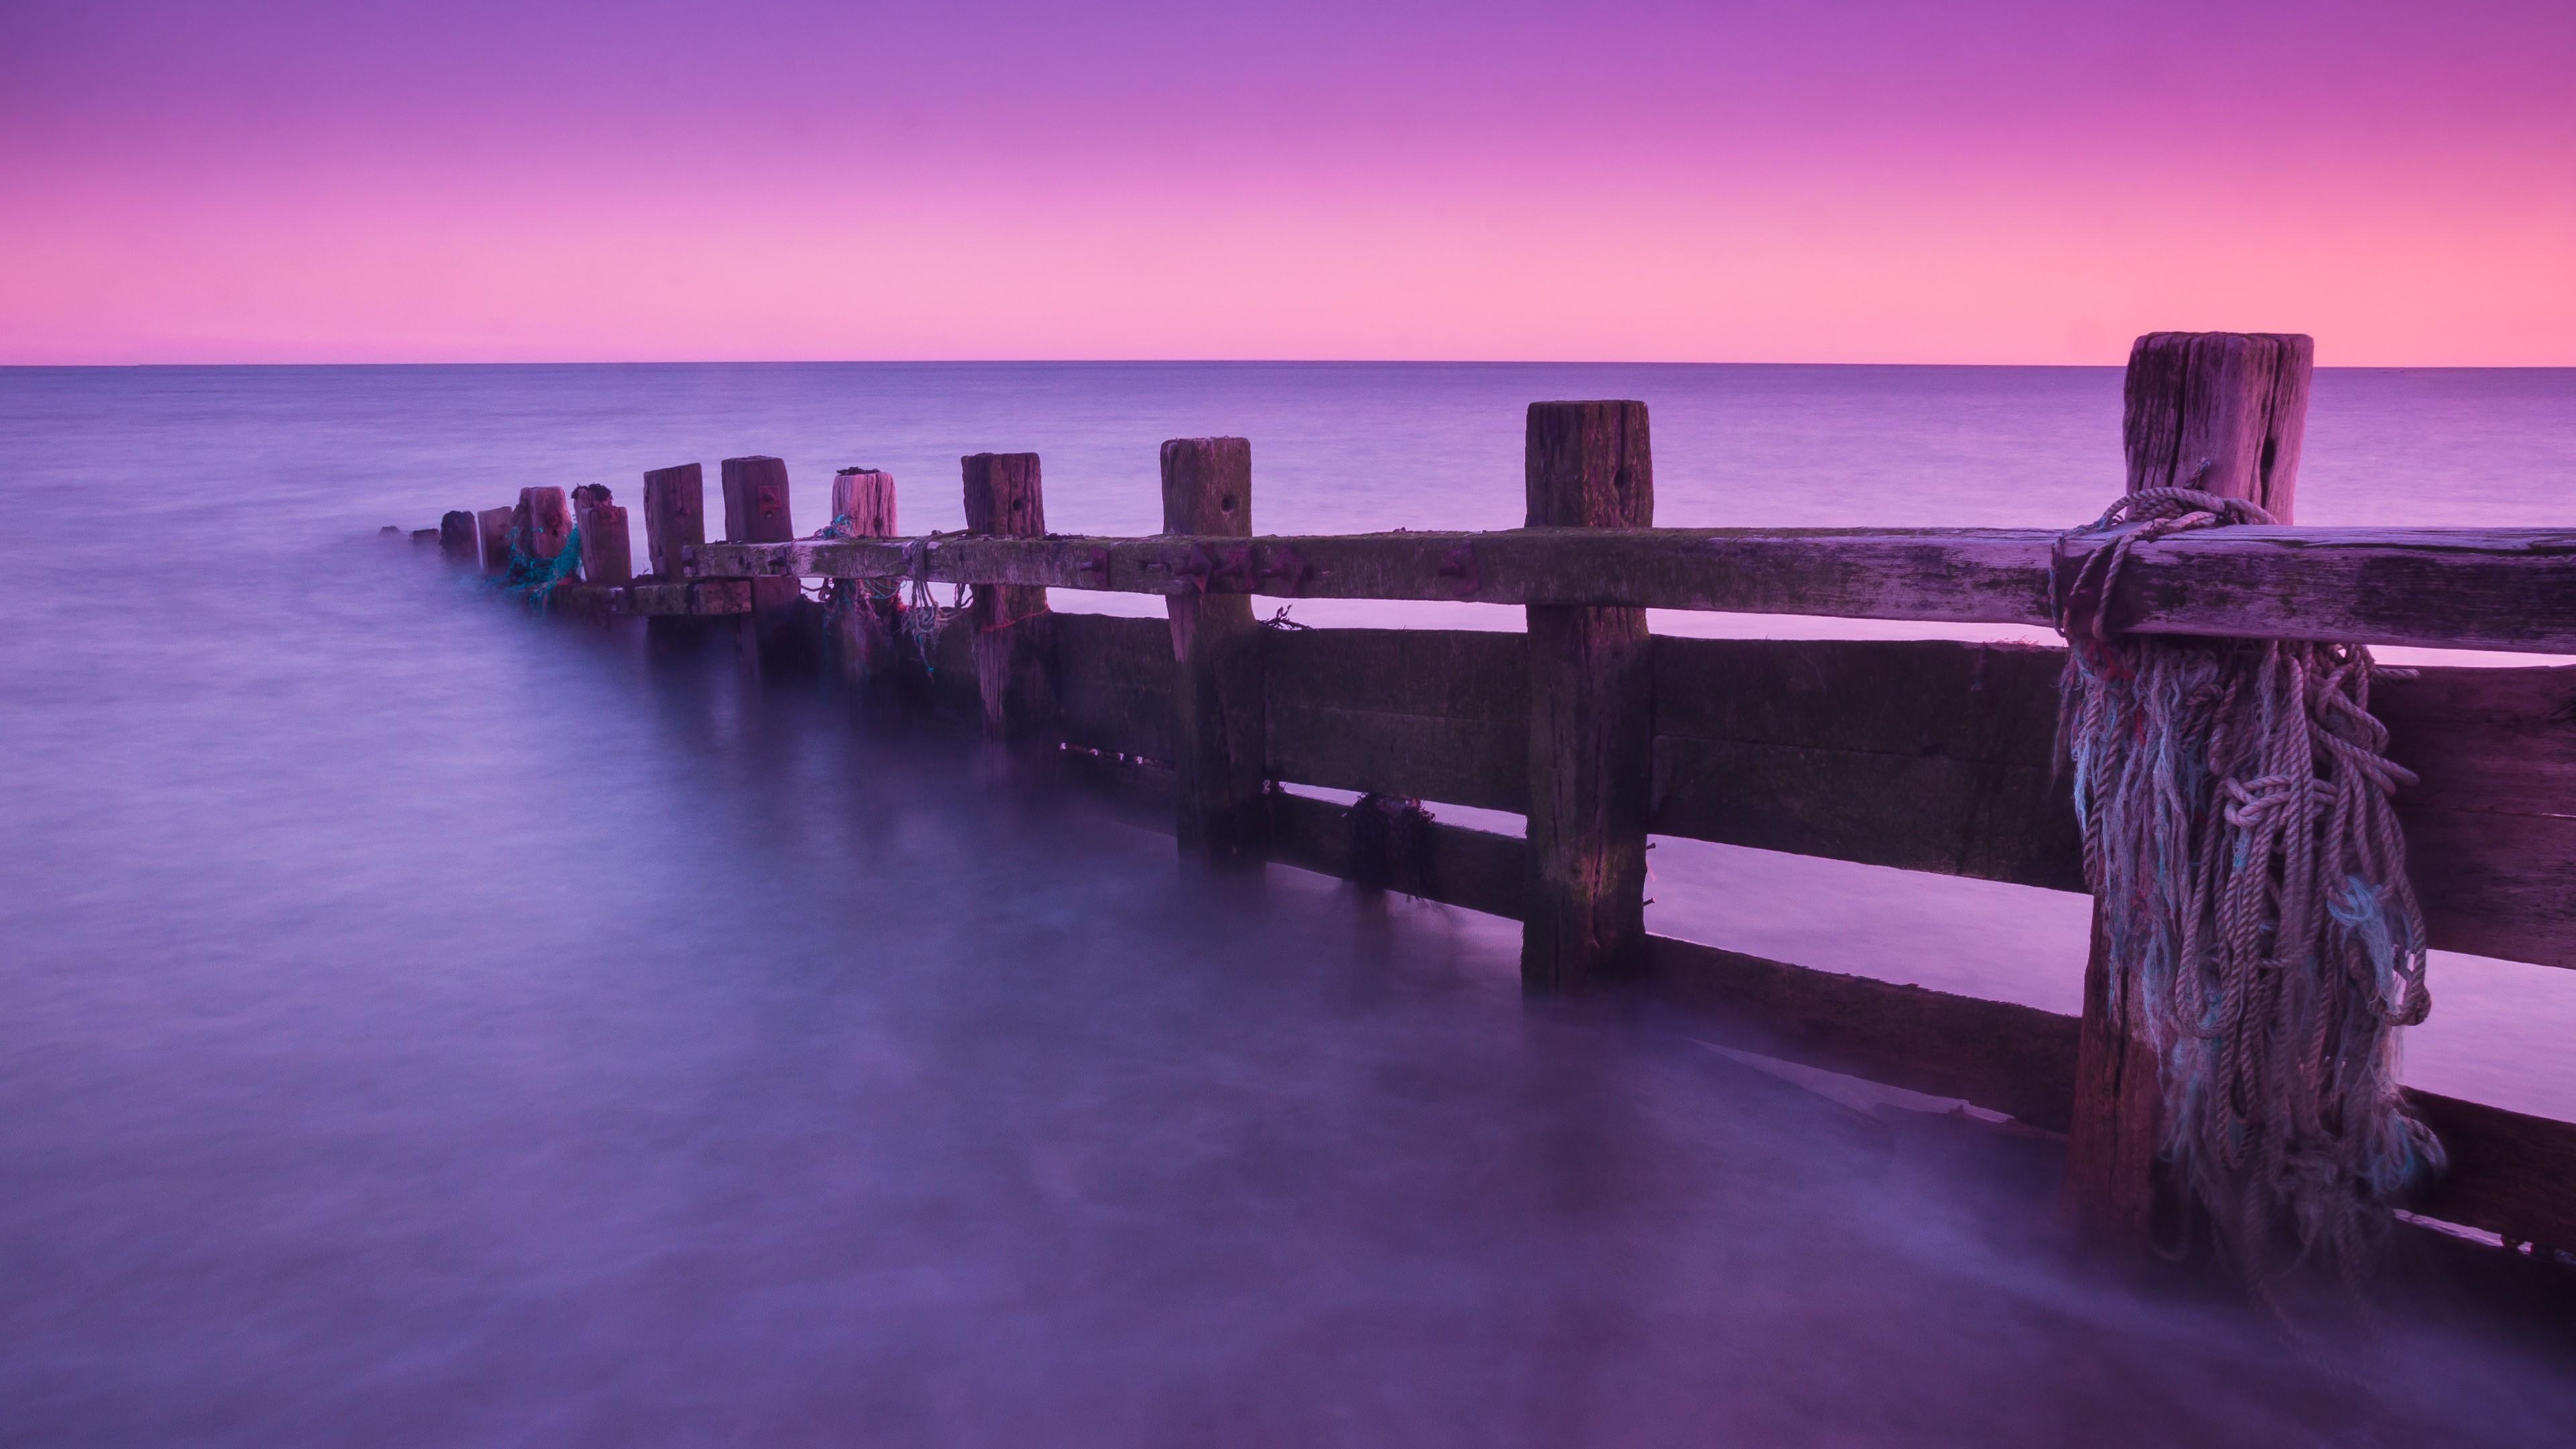 Purple Sunset Over The Sea HD Wallpaper Wallpaper Studio  Tens